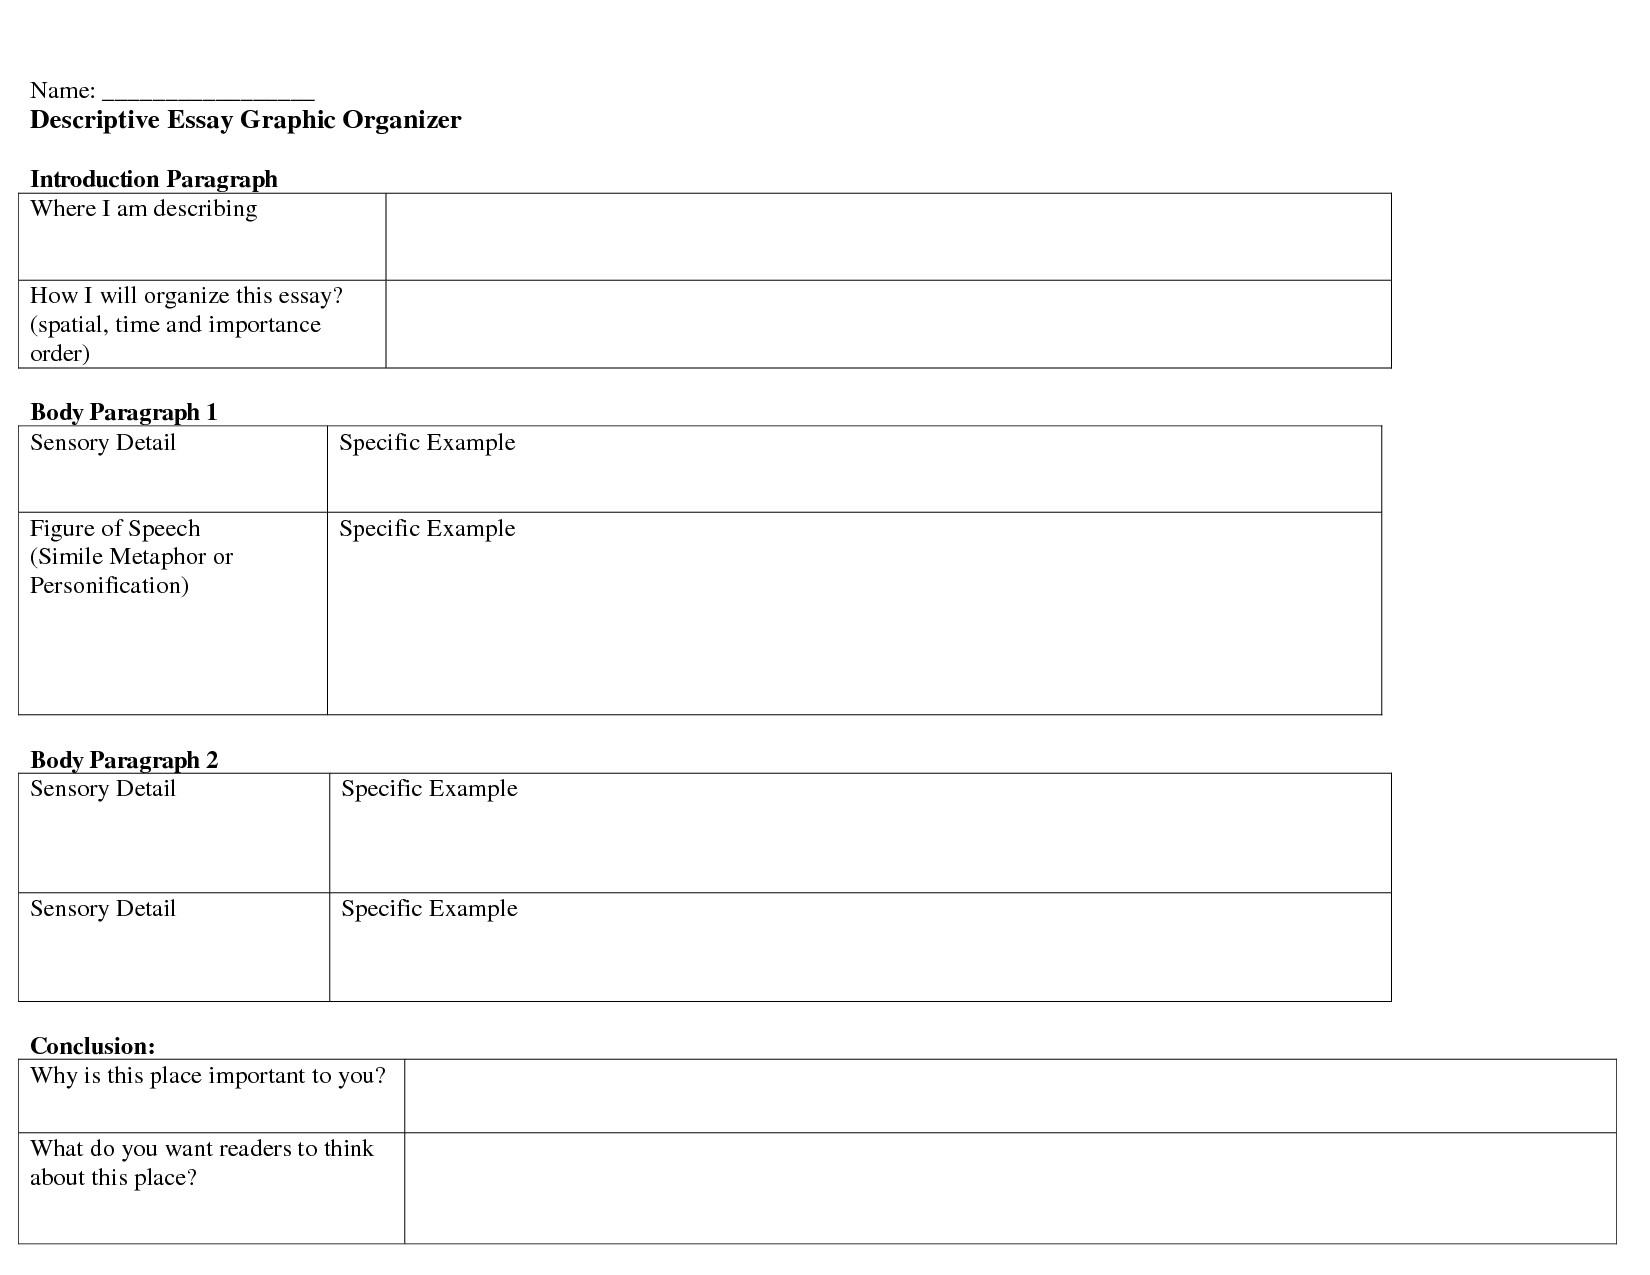 001 Essay Example College Organizer Corner Of Chart And Surprising Application Graphic Organizers Argumentative Full